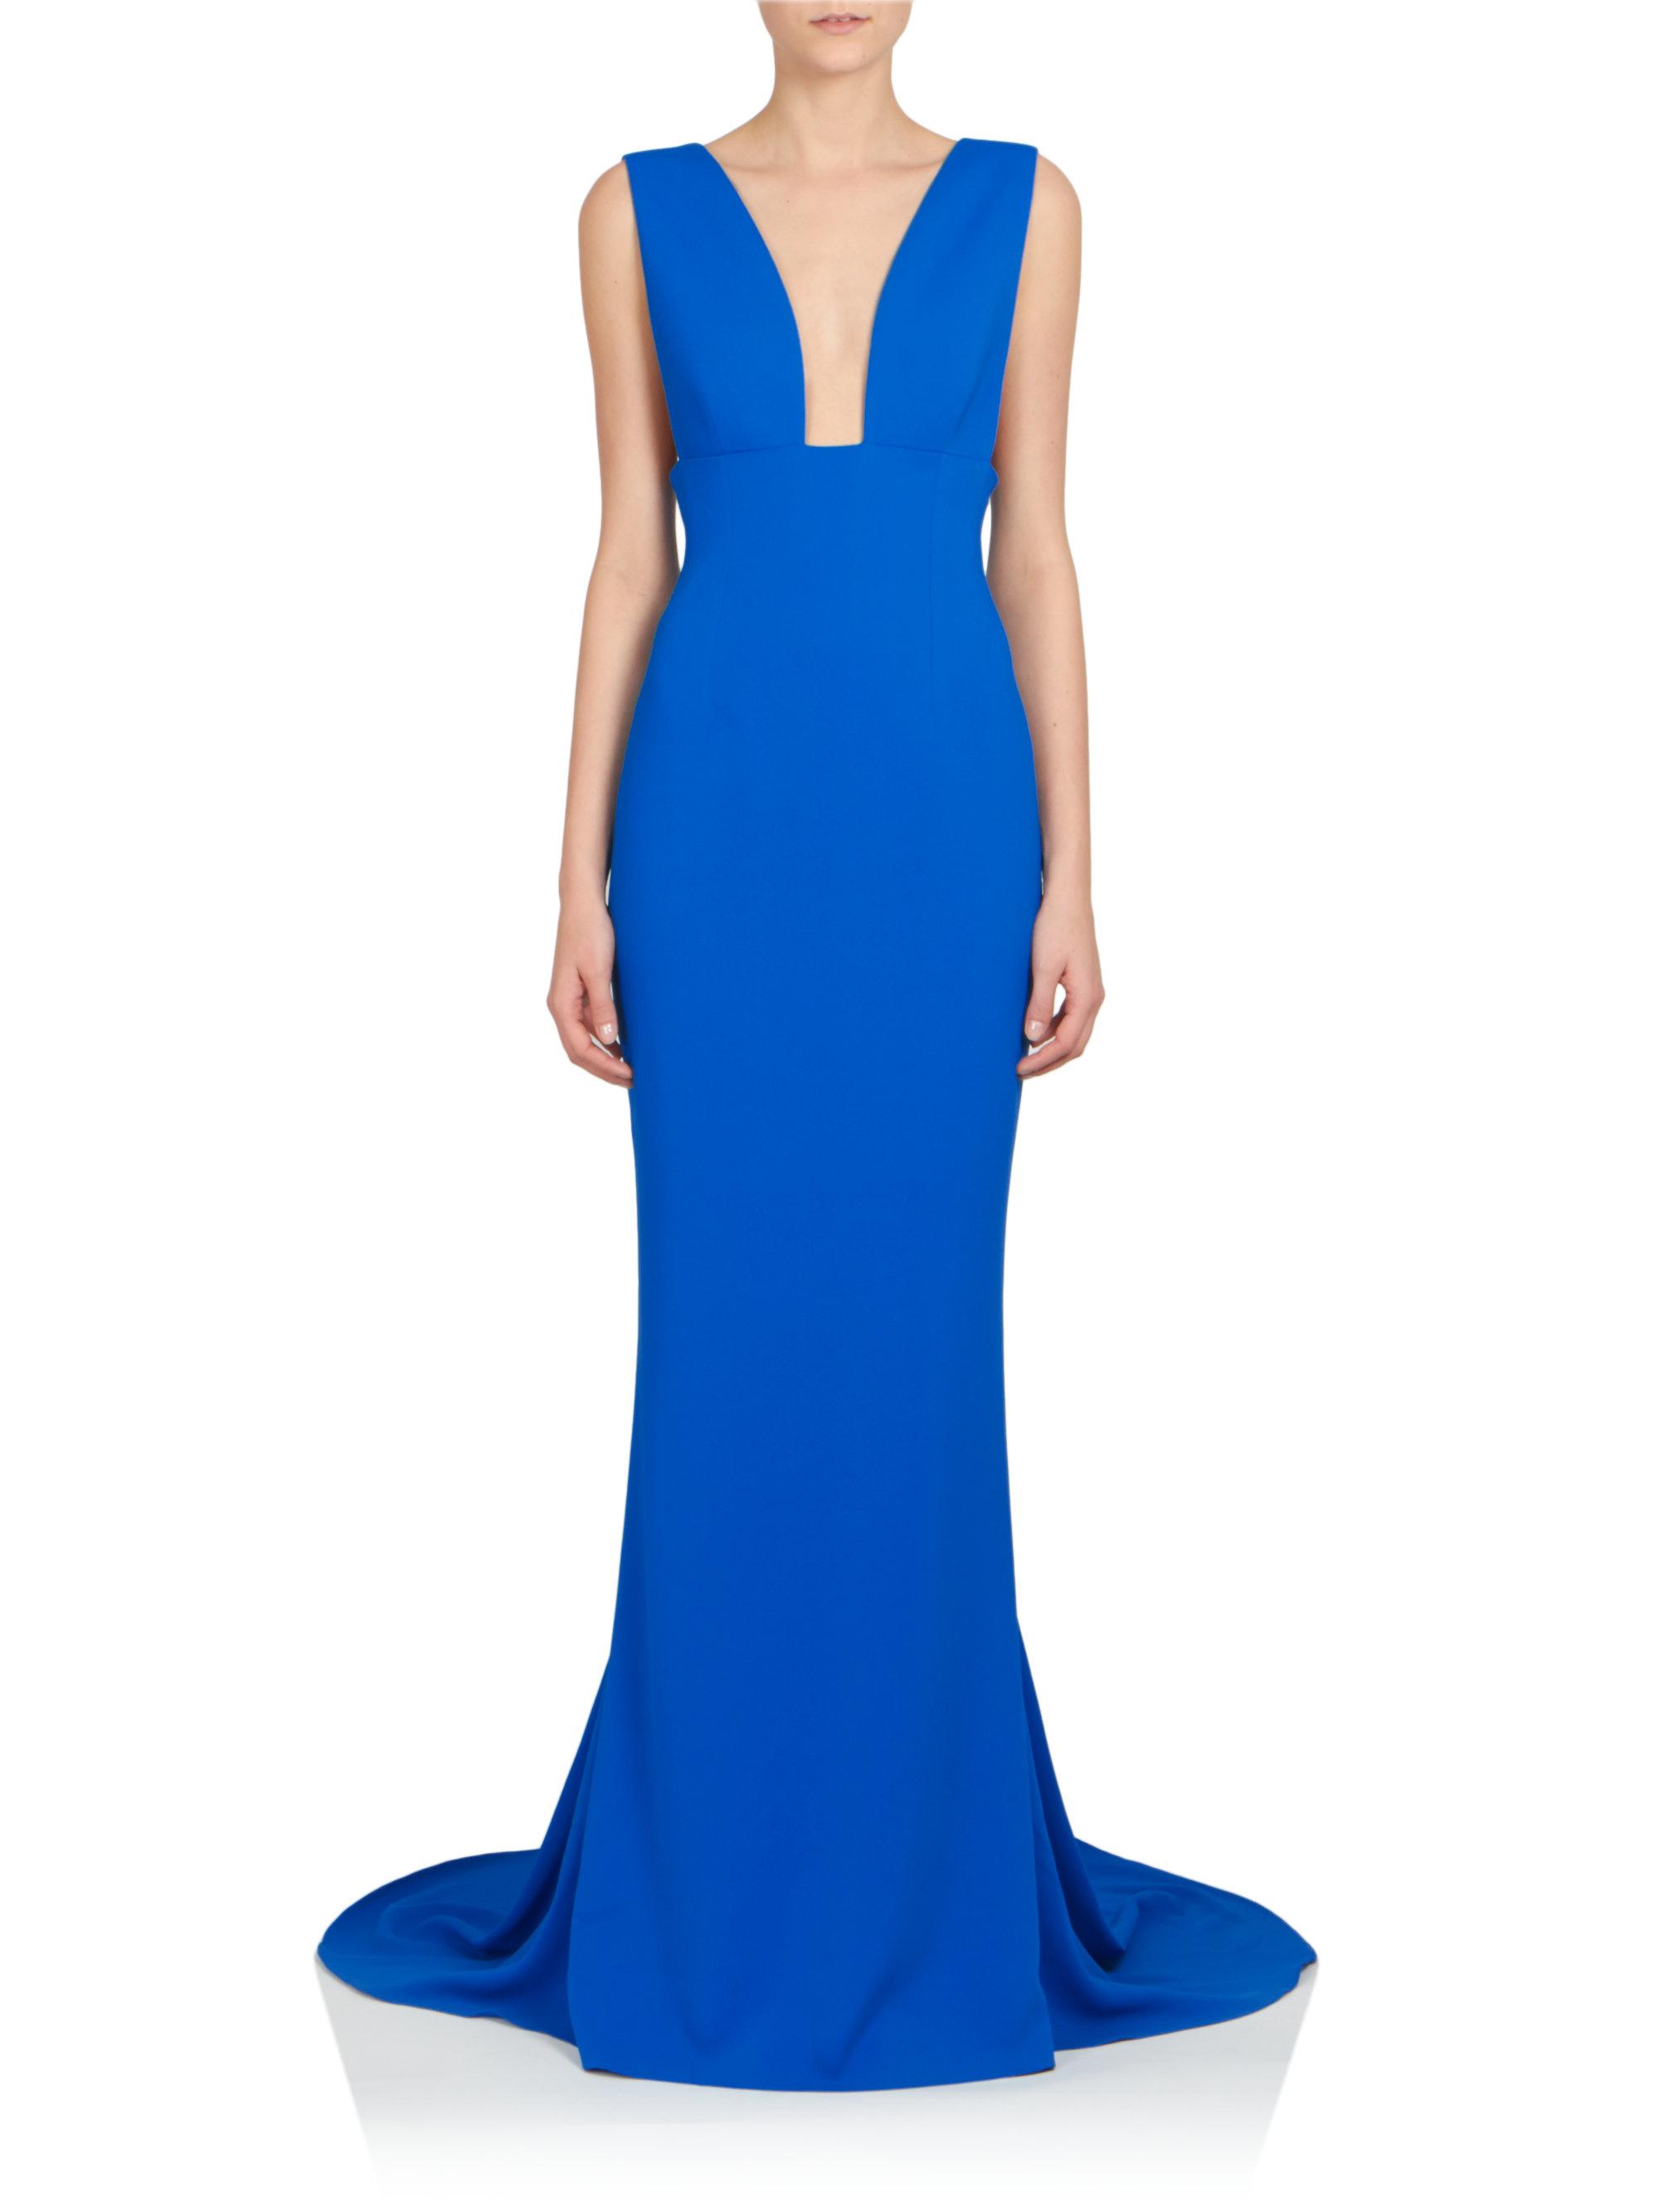 5afe8c9cdf5c Lyst - Stella McCartney Plunging V-neck Gown in Blue